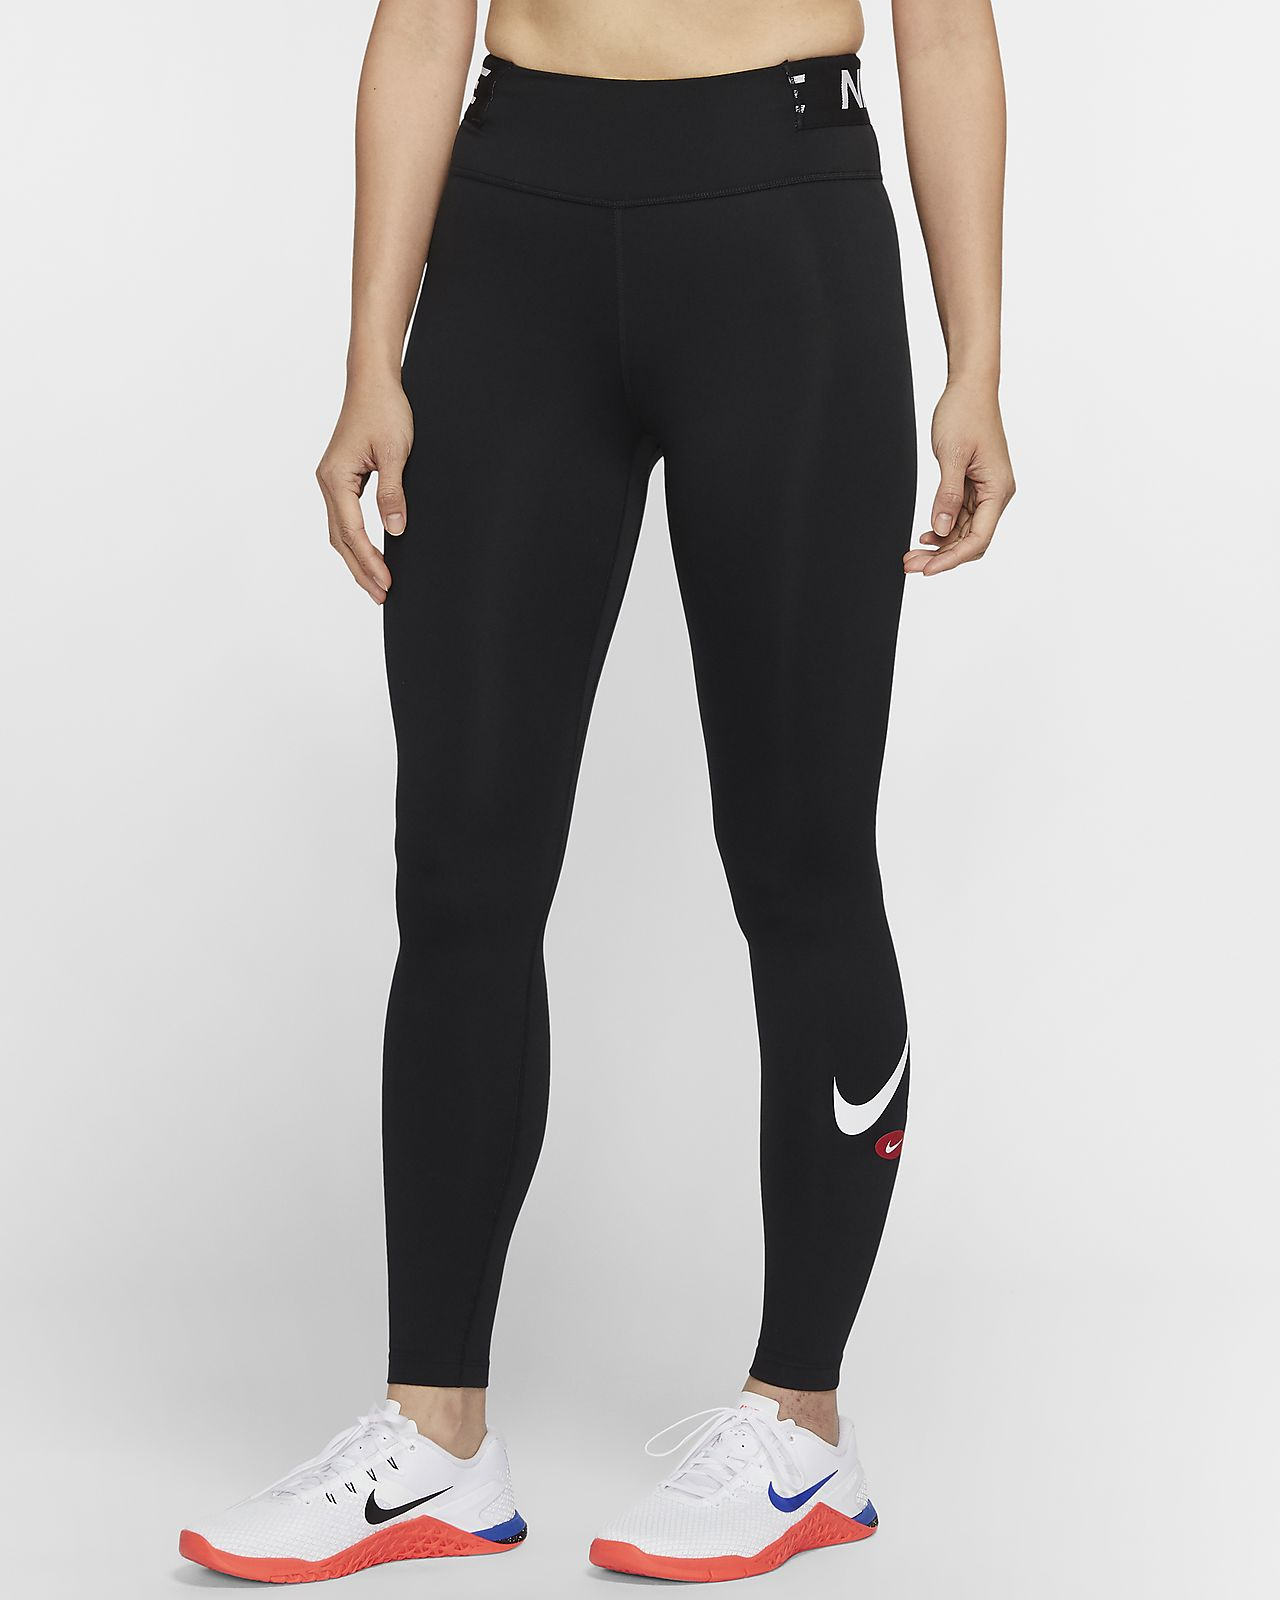 Nike One 女子紧身裤